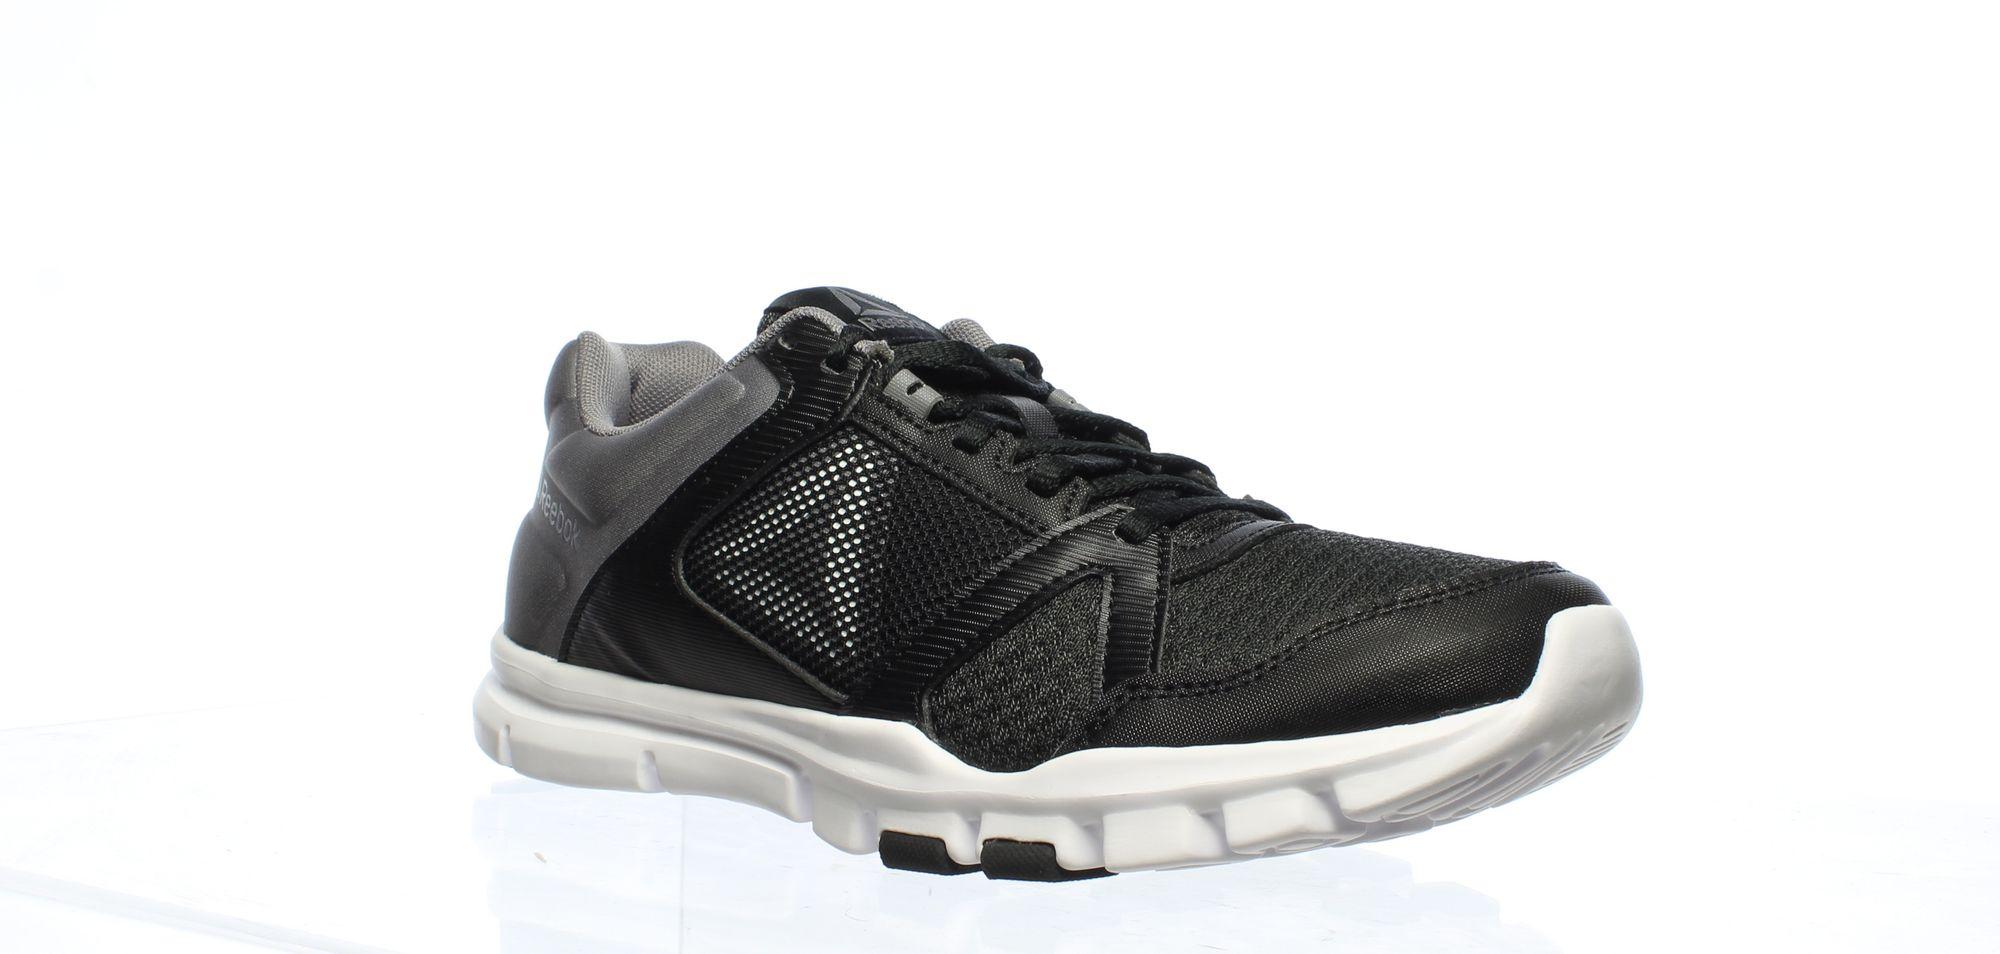 Reebok-Mens-Yourflex-Train-10-Cross-Training-Shoes miniature 4